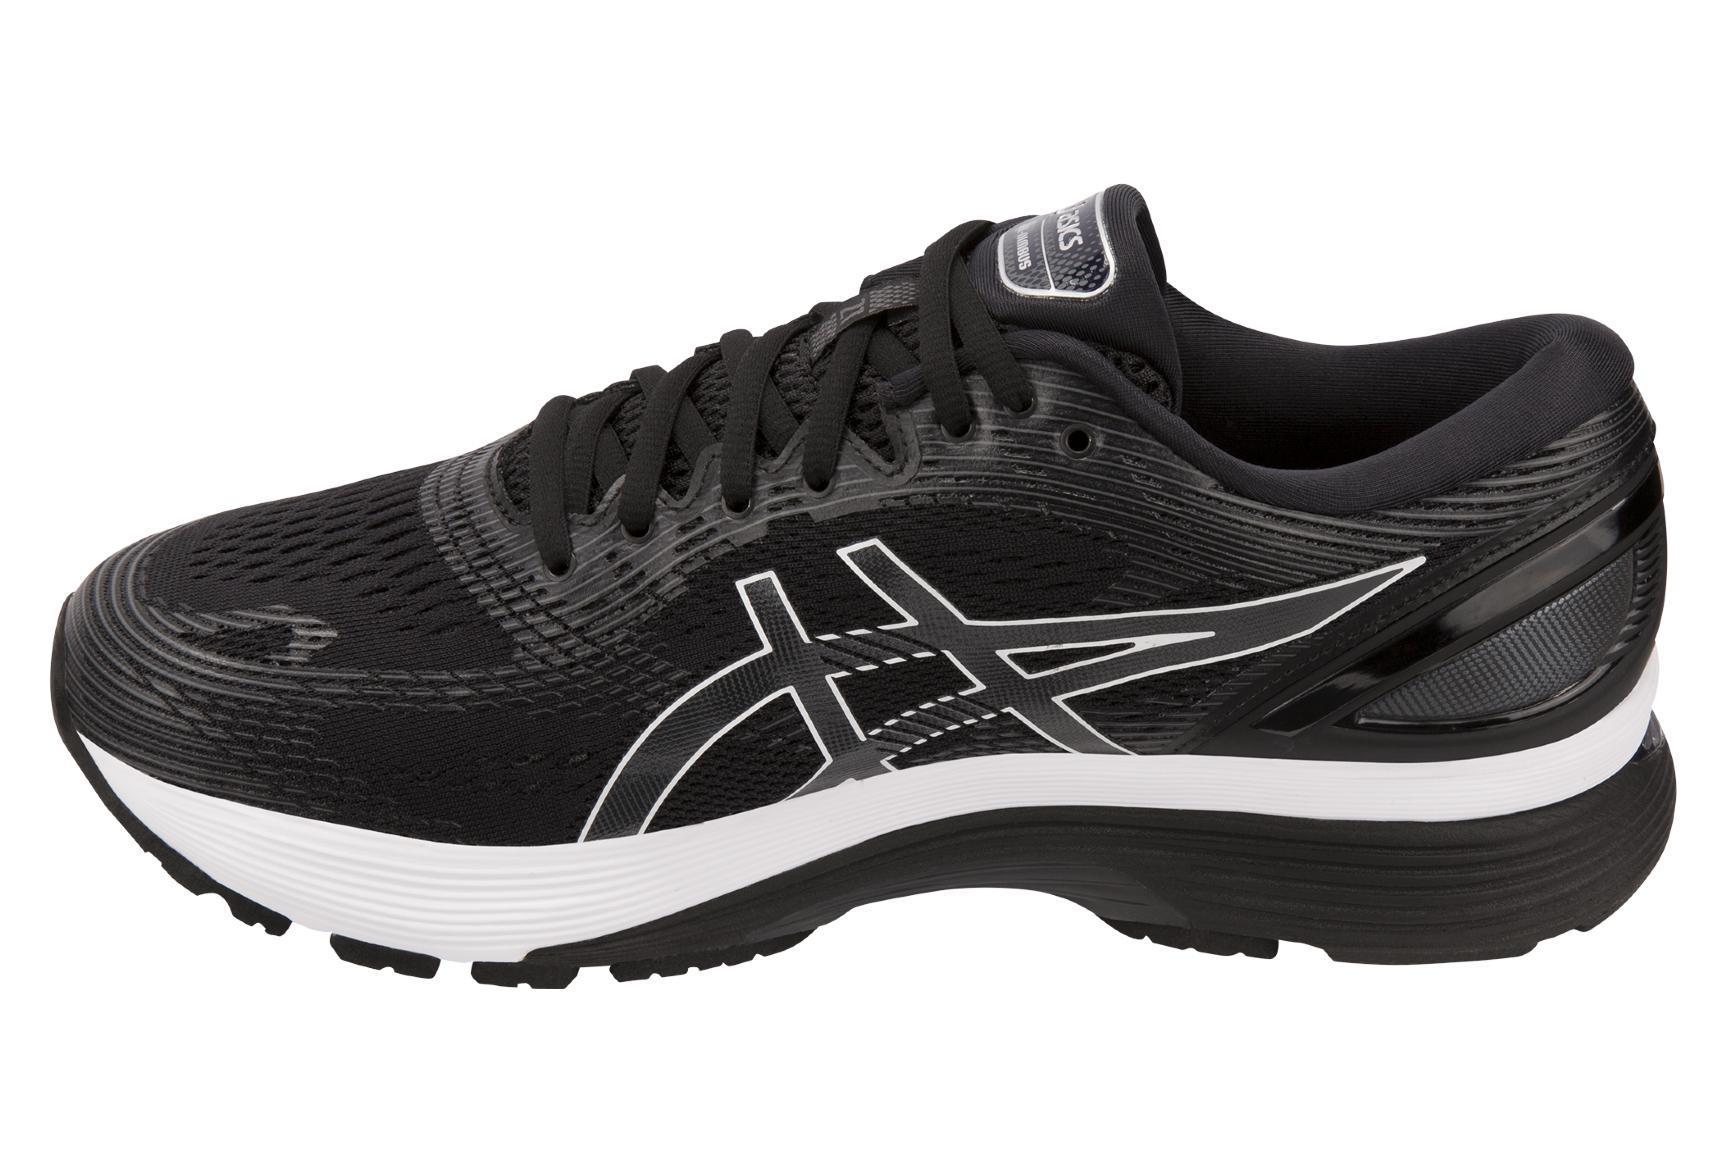 Asics Schuhe Run Gel Nimbus 21 Black White